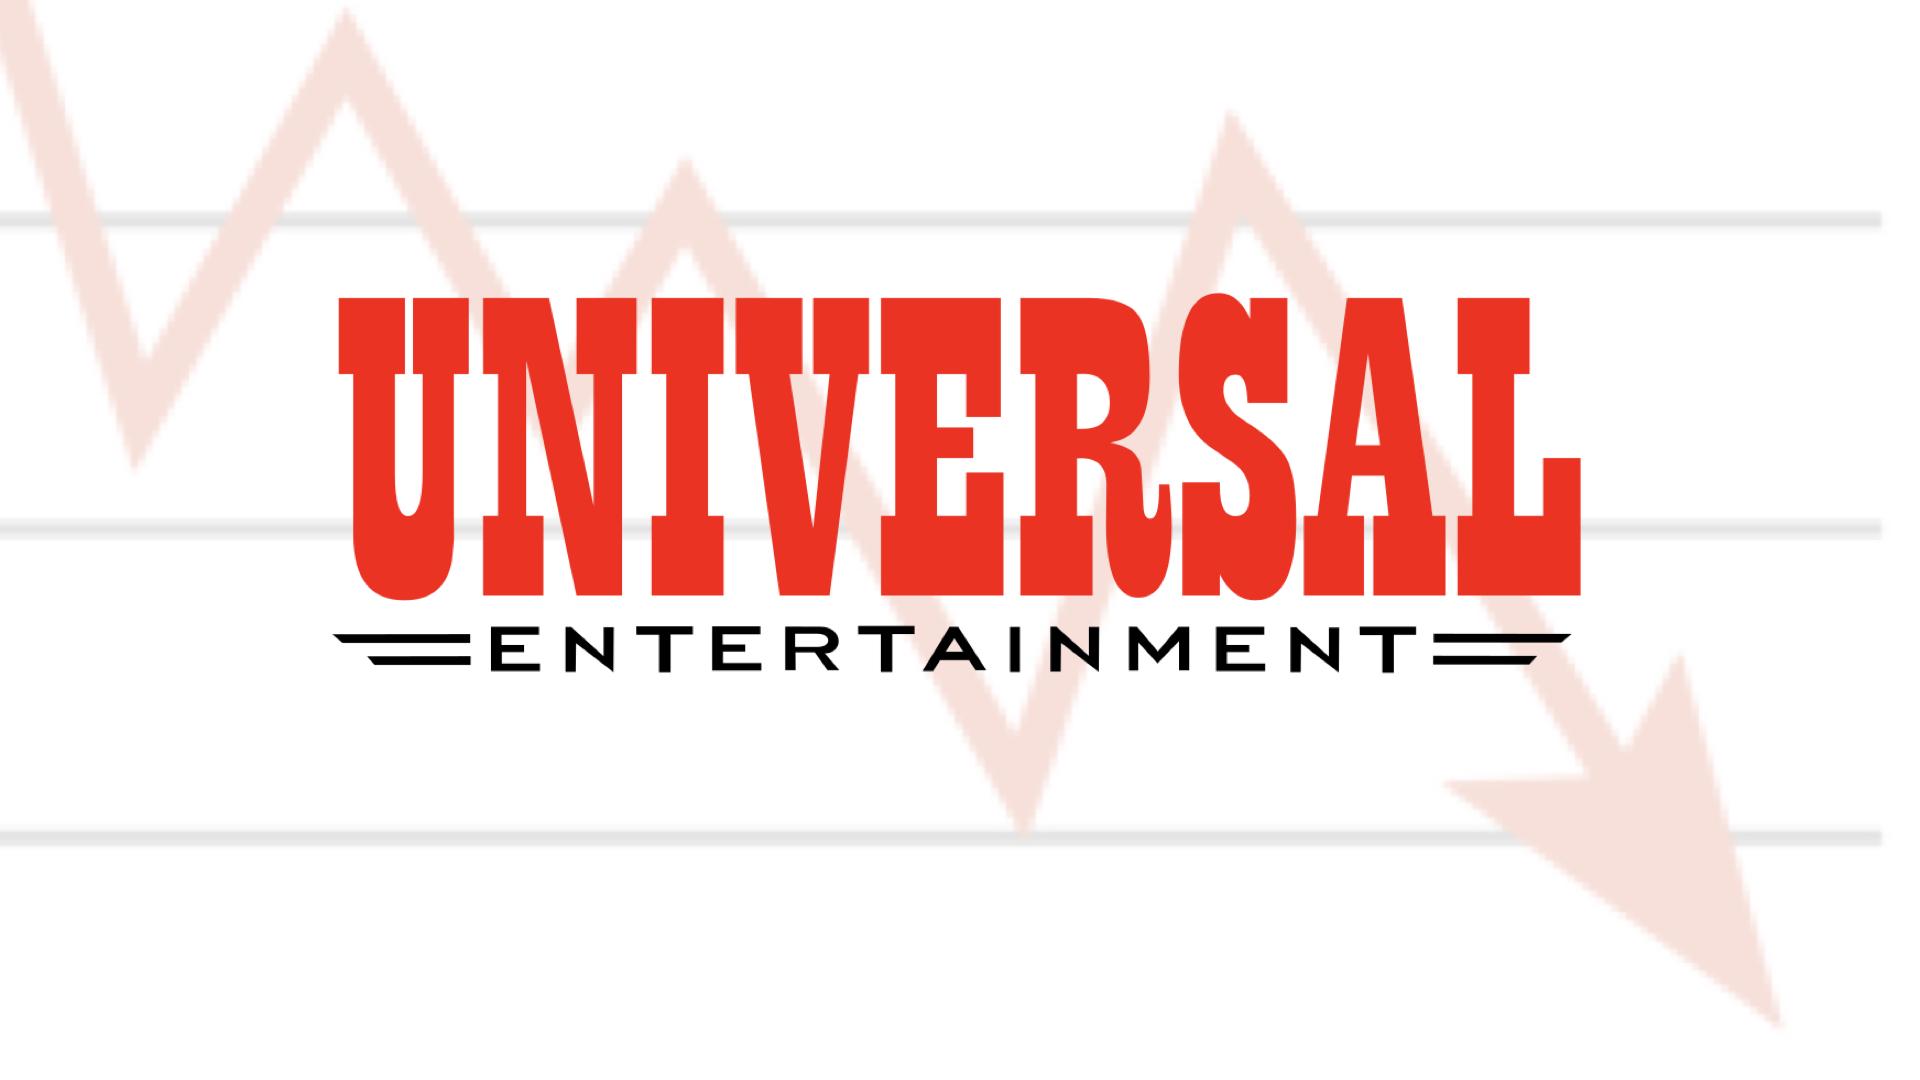 Universal Entertainment